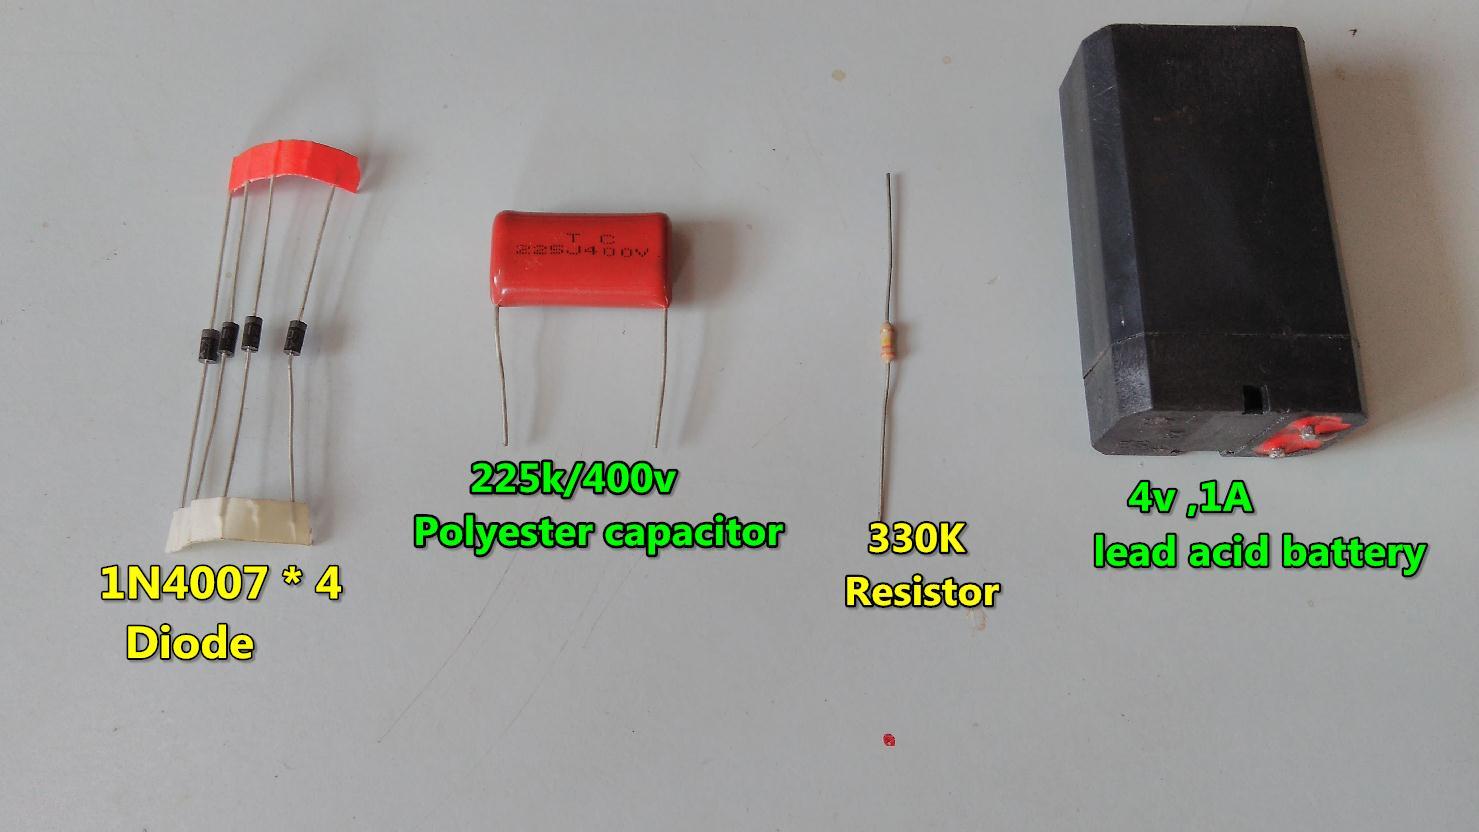 4v lead acid battery charger without transformer // 230v AC